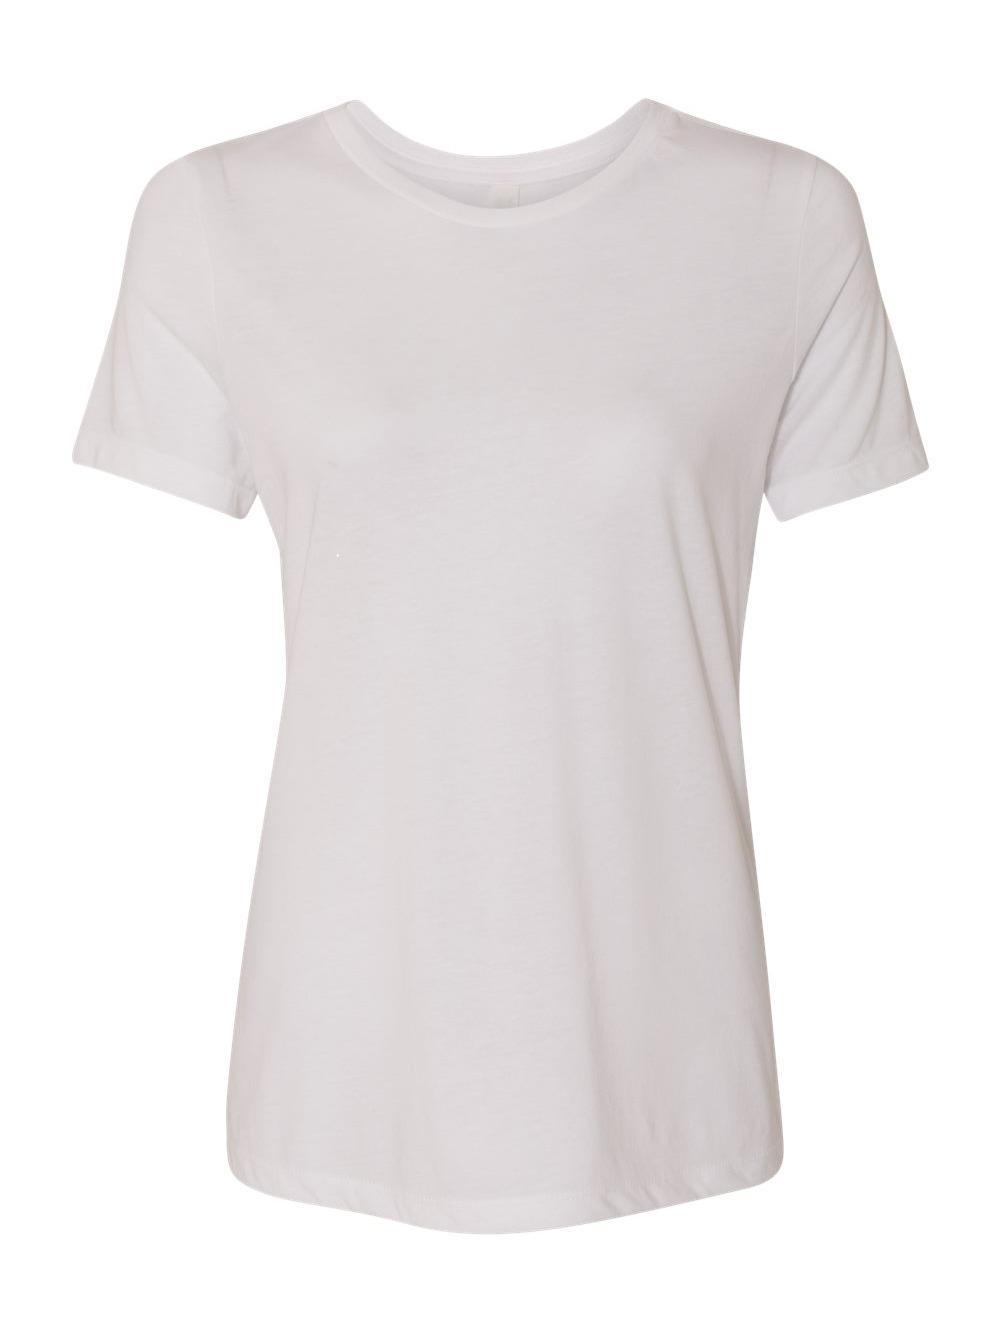 Bella-Canvas-Women-039-s-Relaxed-Short-Sleeve-Jersey-Tee-6400 thumbnail 78